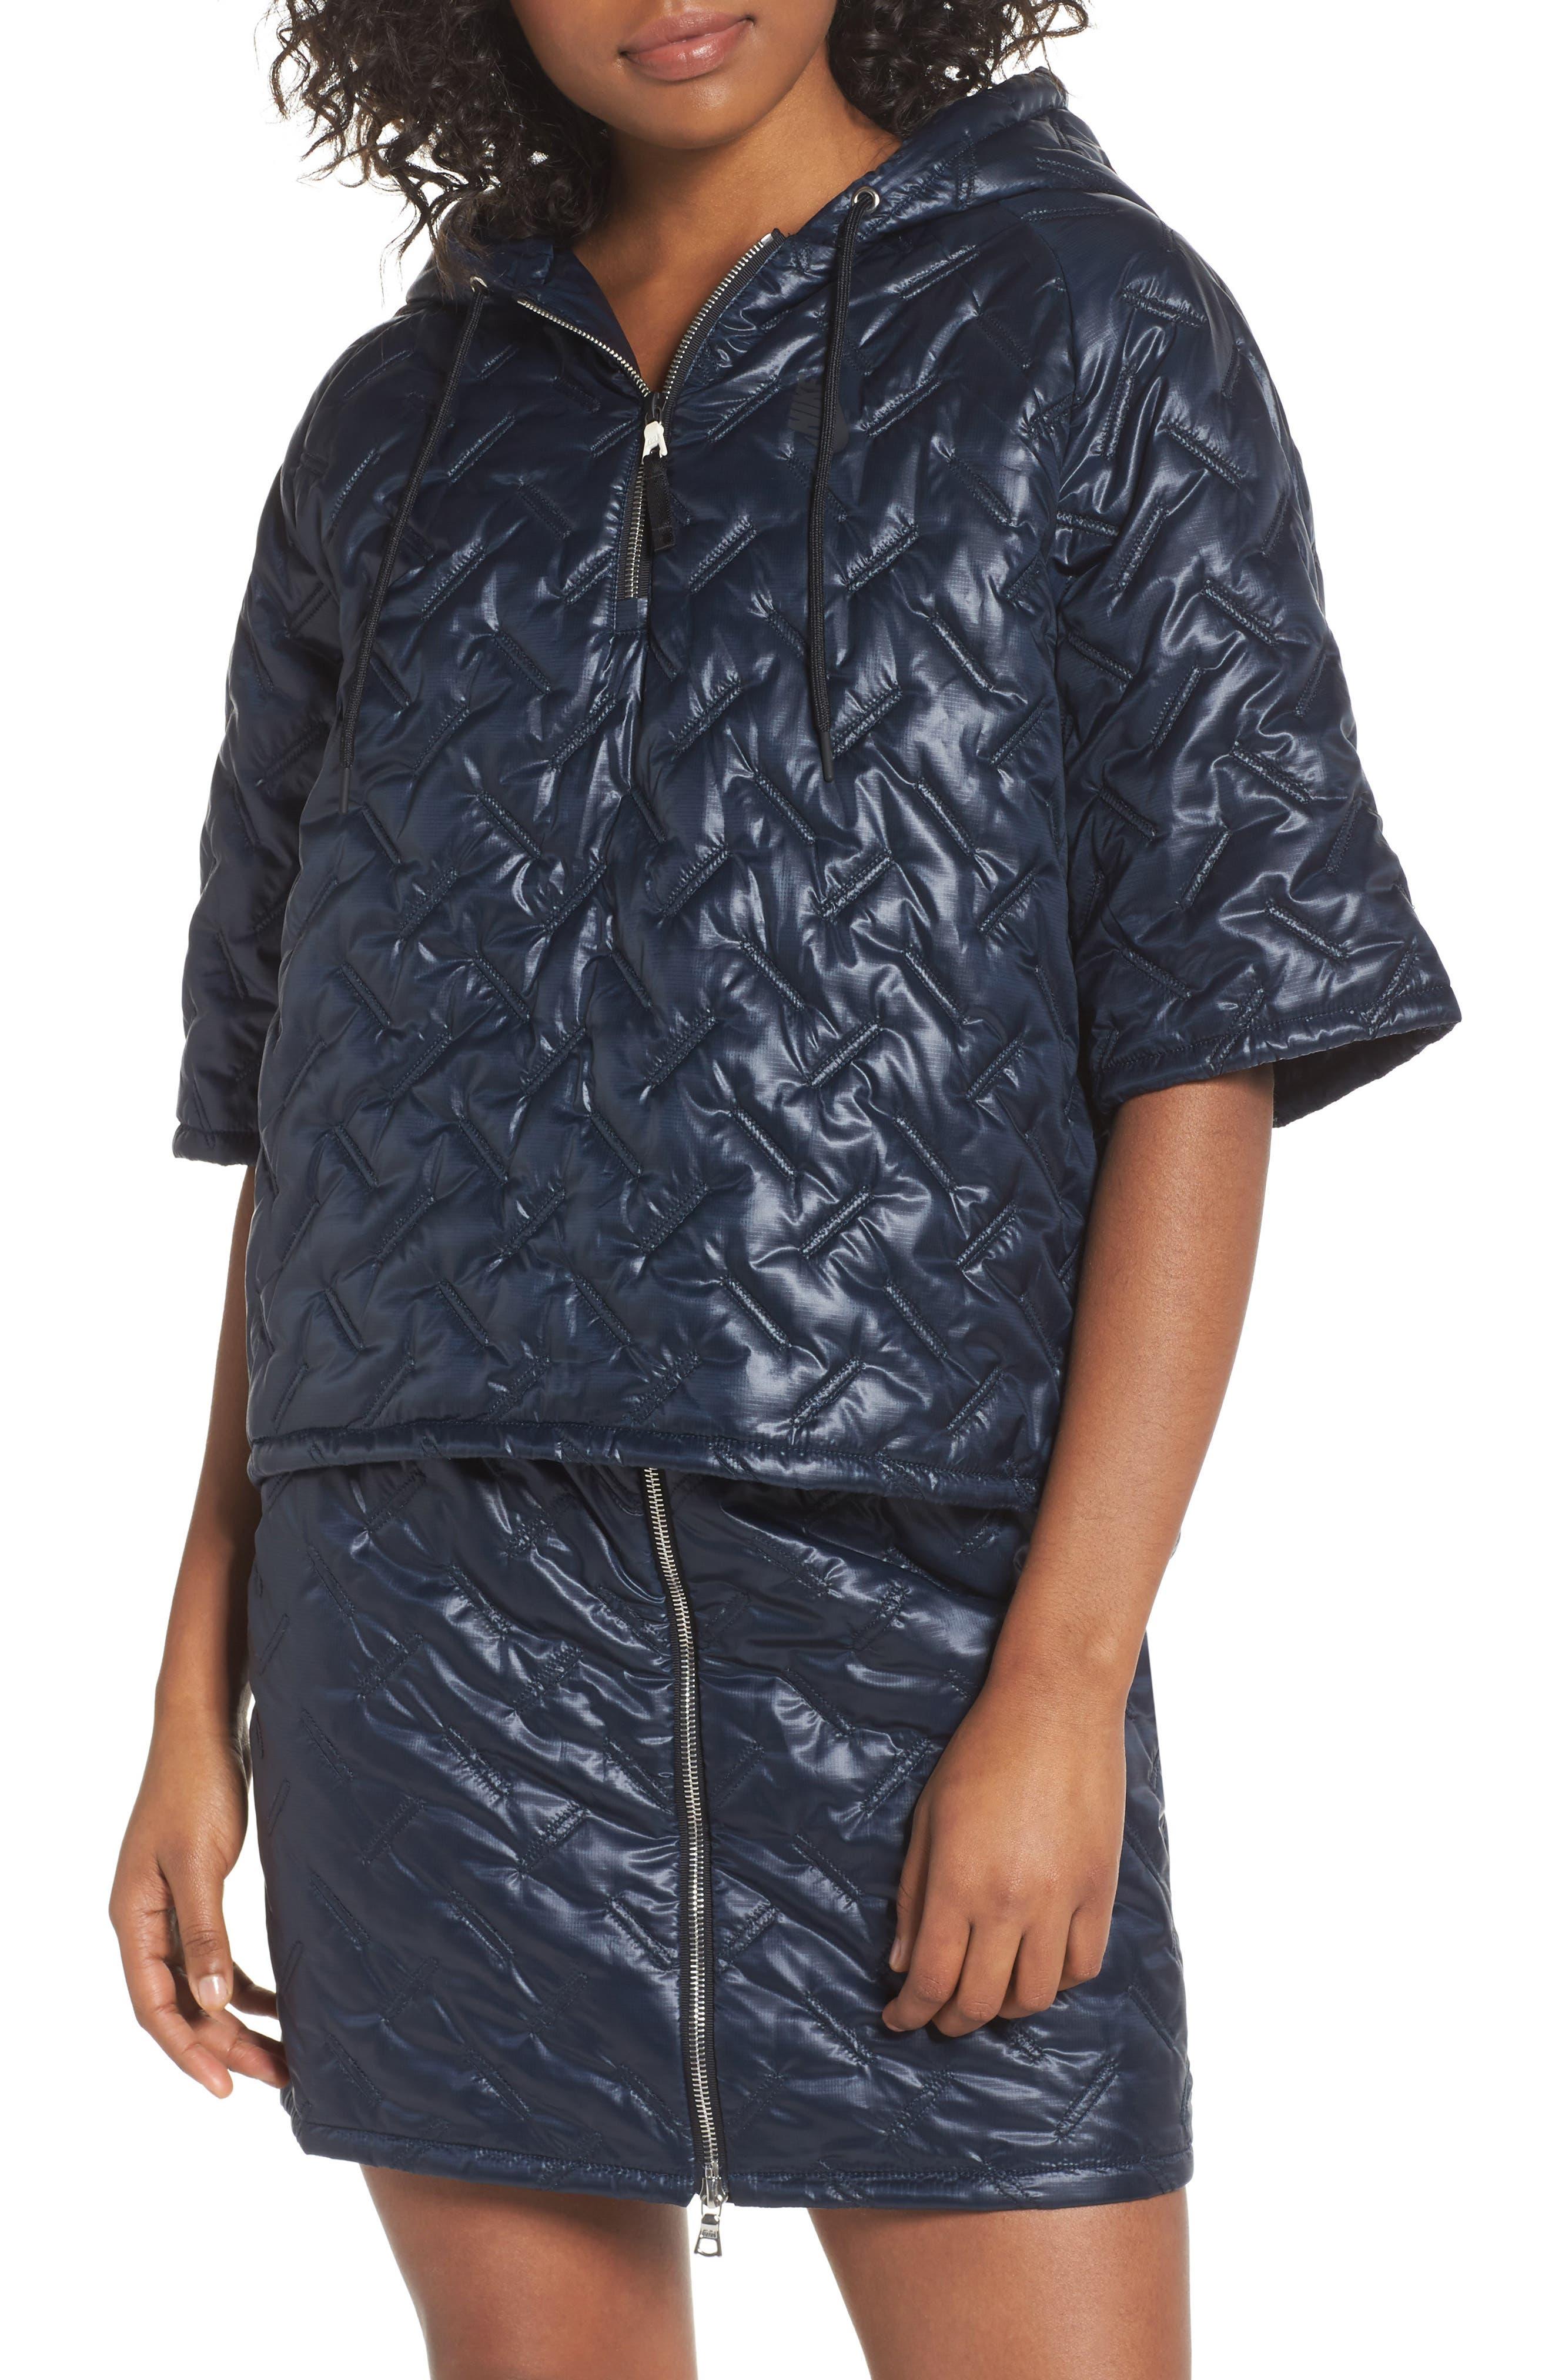 NikeLab Essentials Insulated Short Sleeve Women's Hoodie,                             Alternate thumbnail 13, color,                             Dark Obsidian/ Black